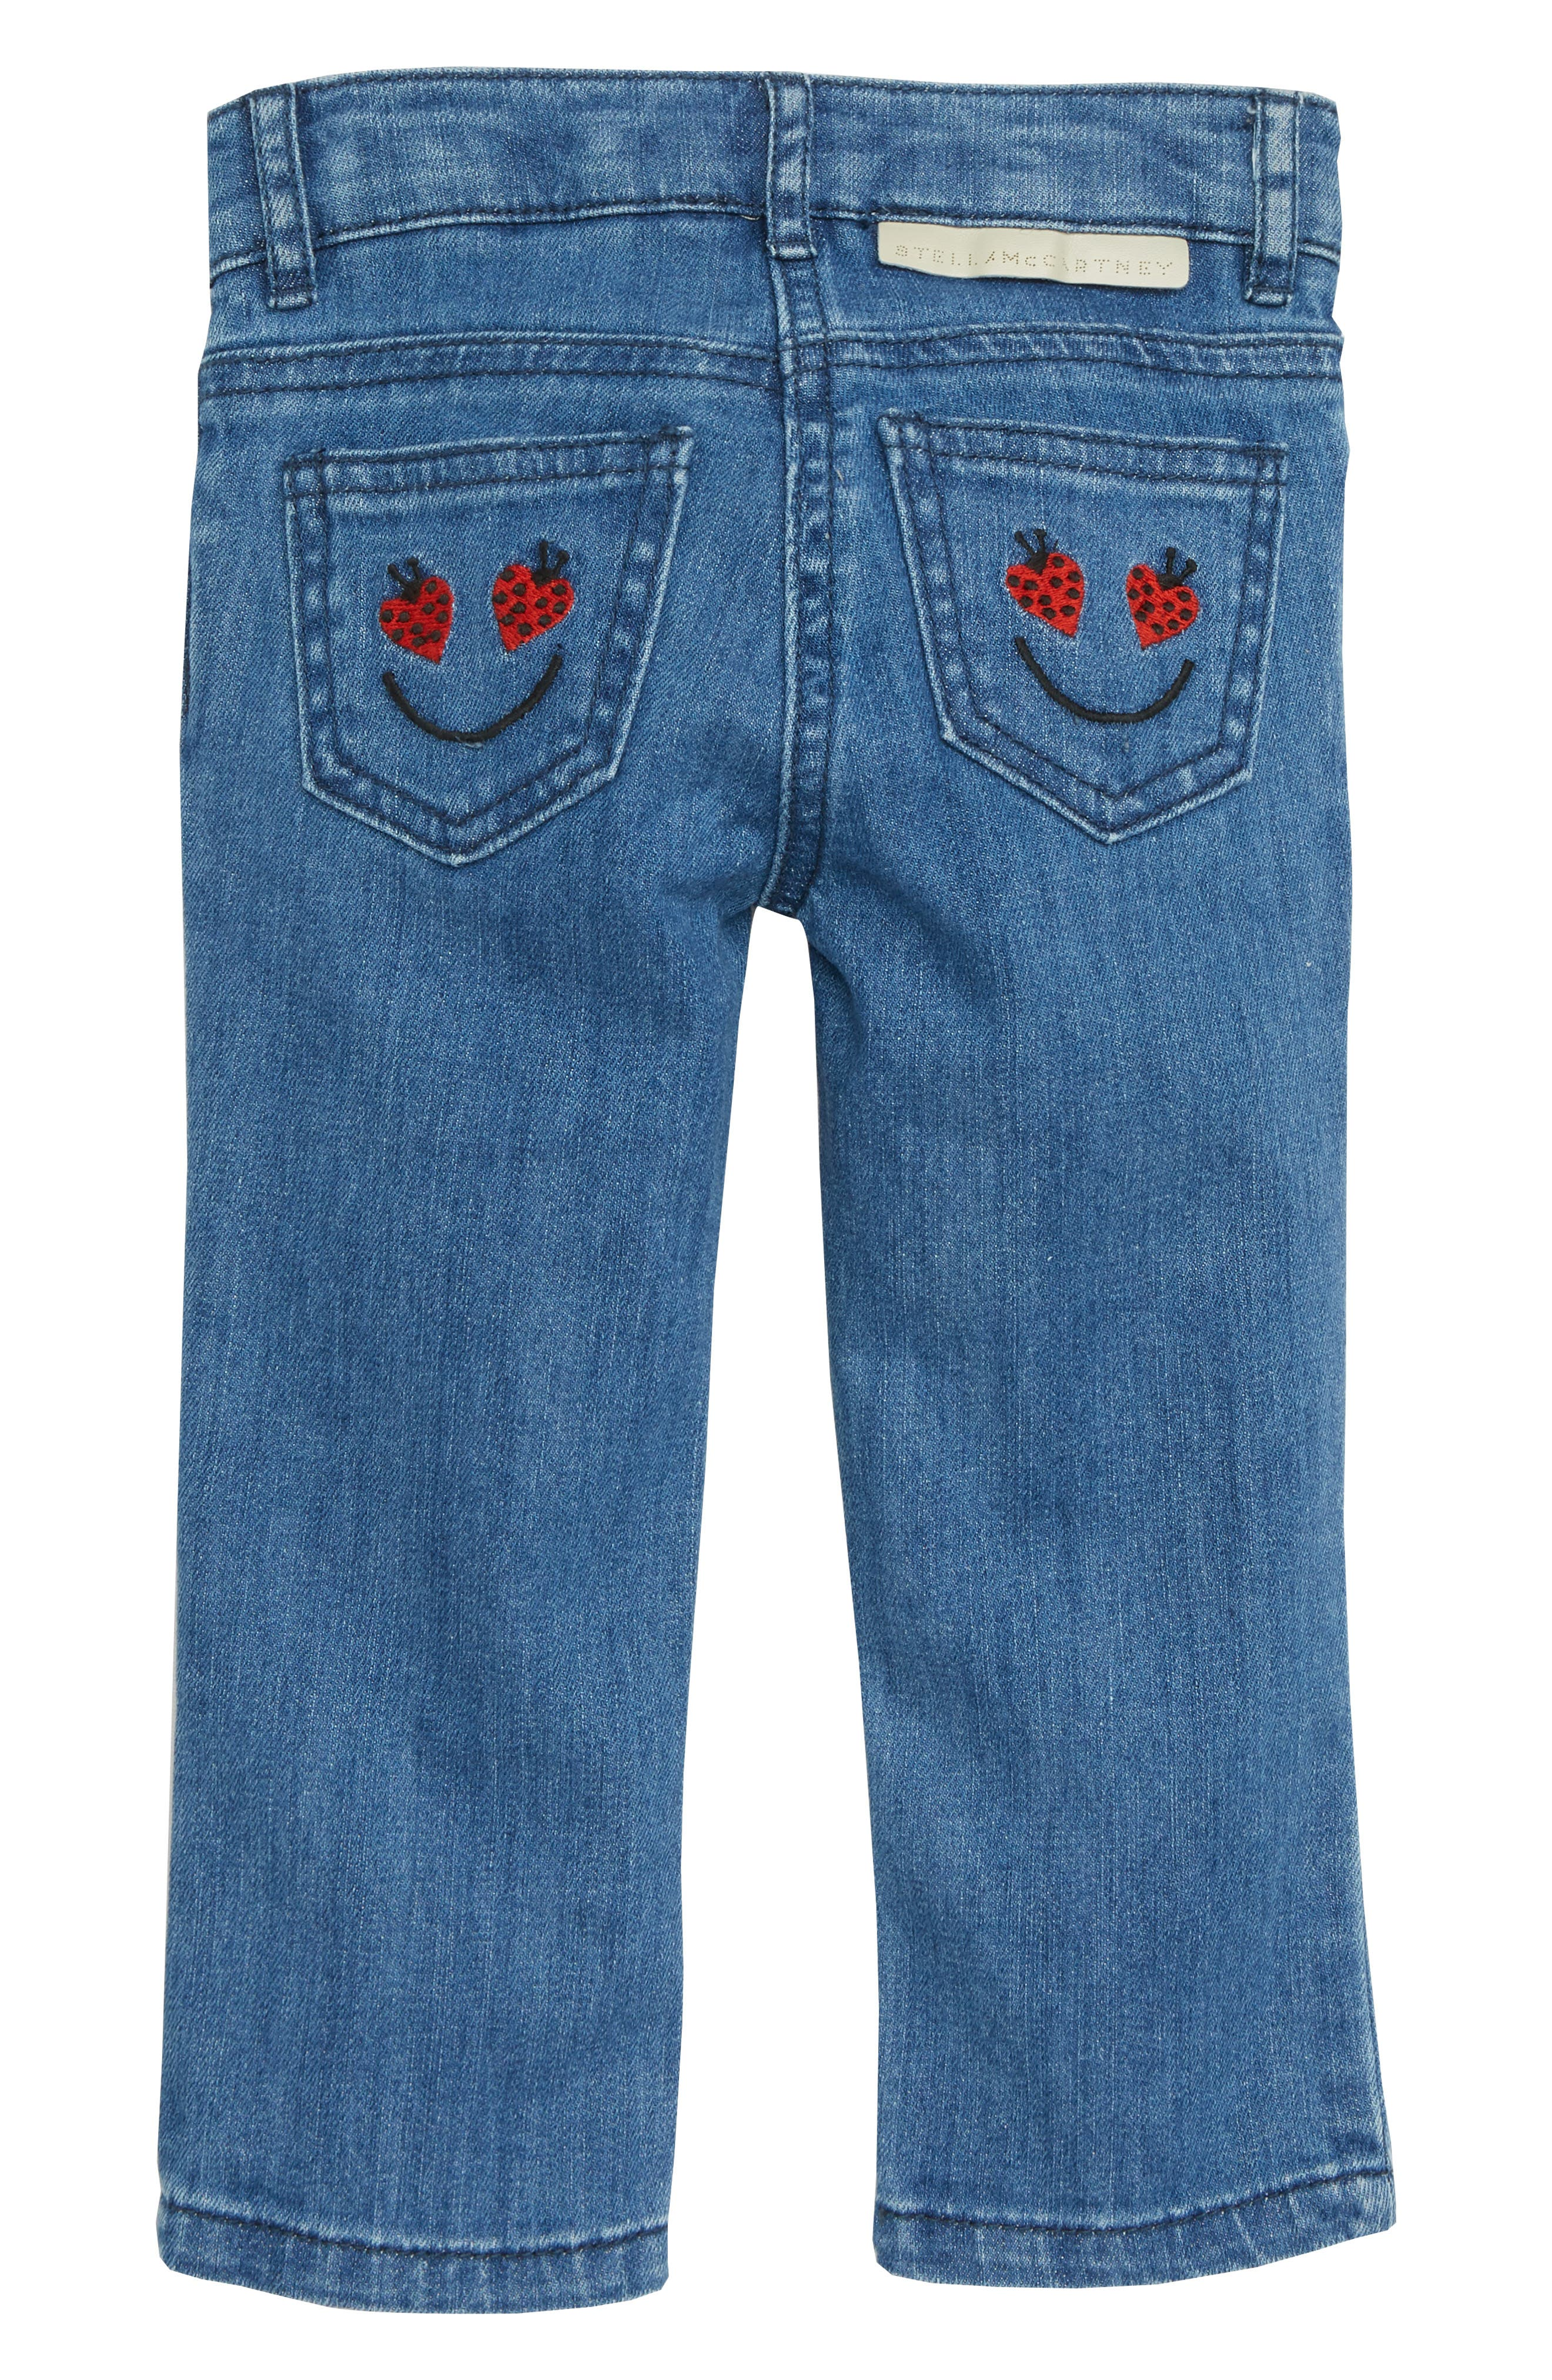 Heart Patch Straight Leg Jeans,                             Alternate thumbnail 2, color,                             BLUE